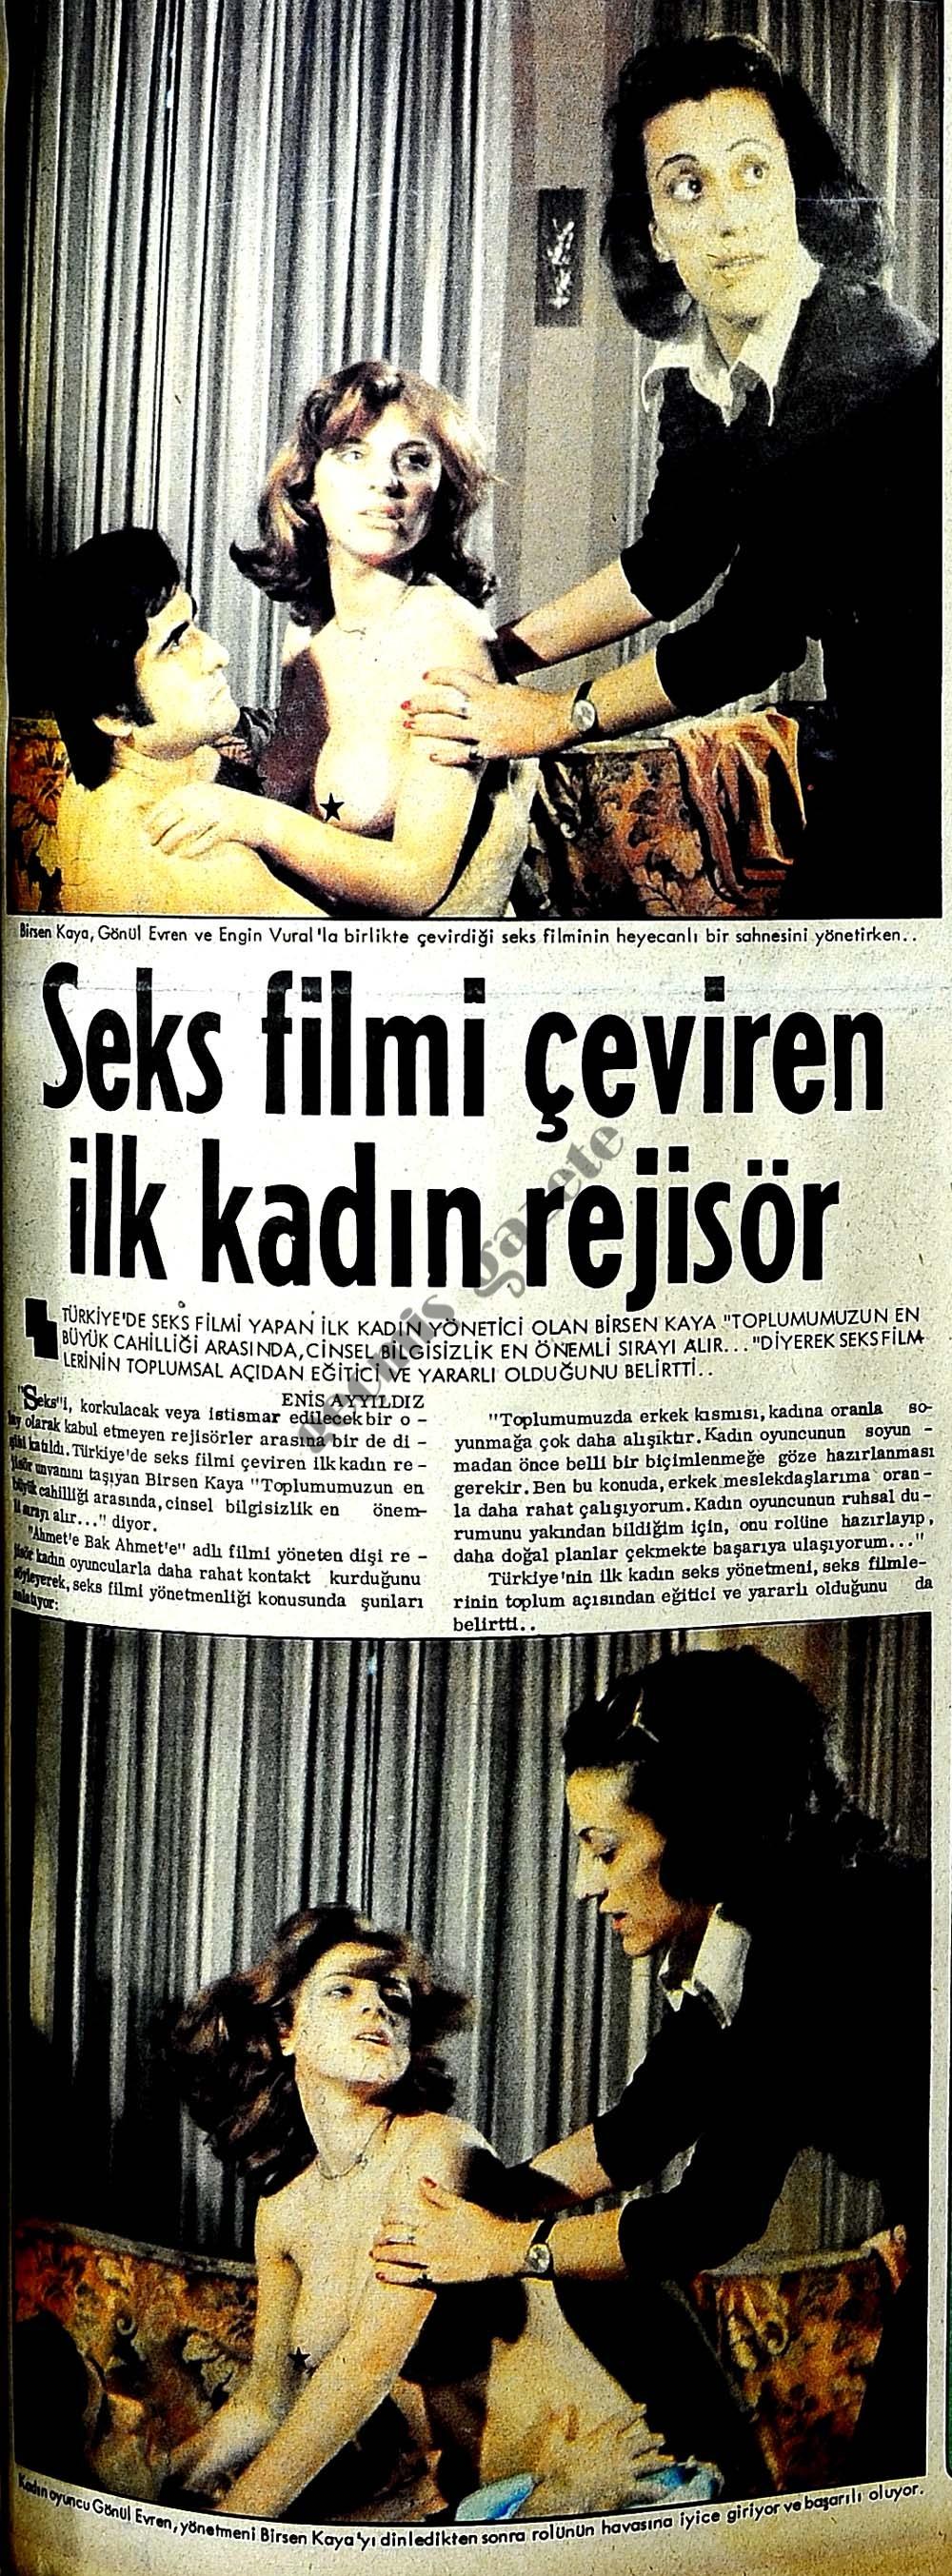 Seks filmi çeviren ilk kadın rejisör